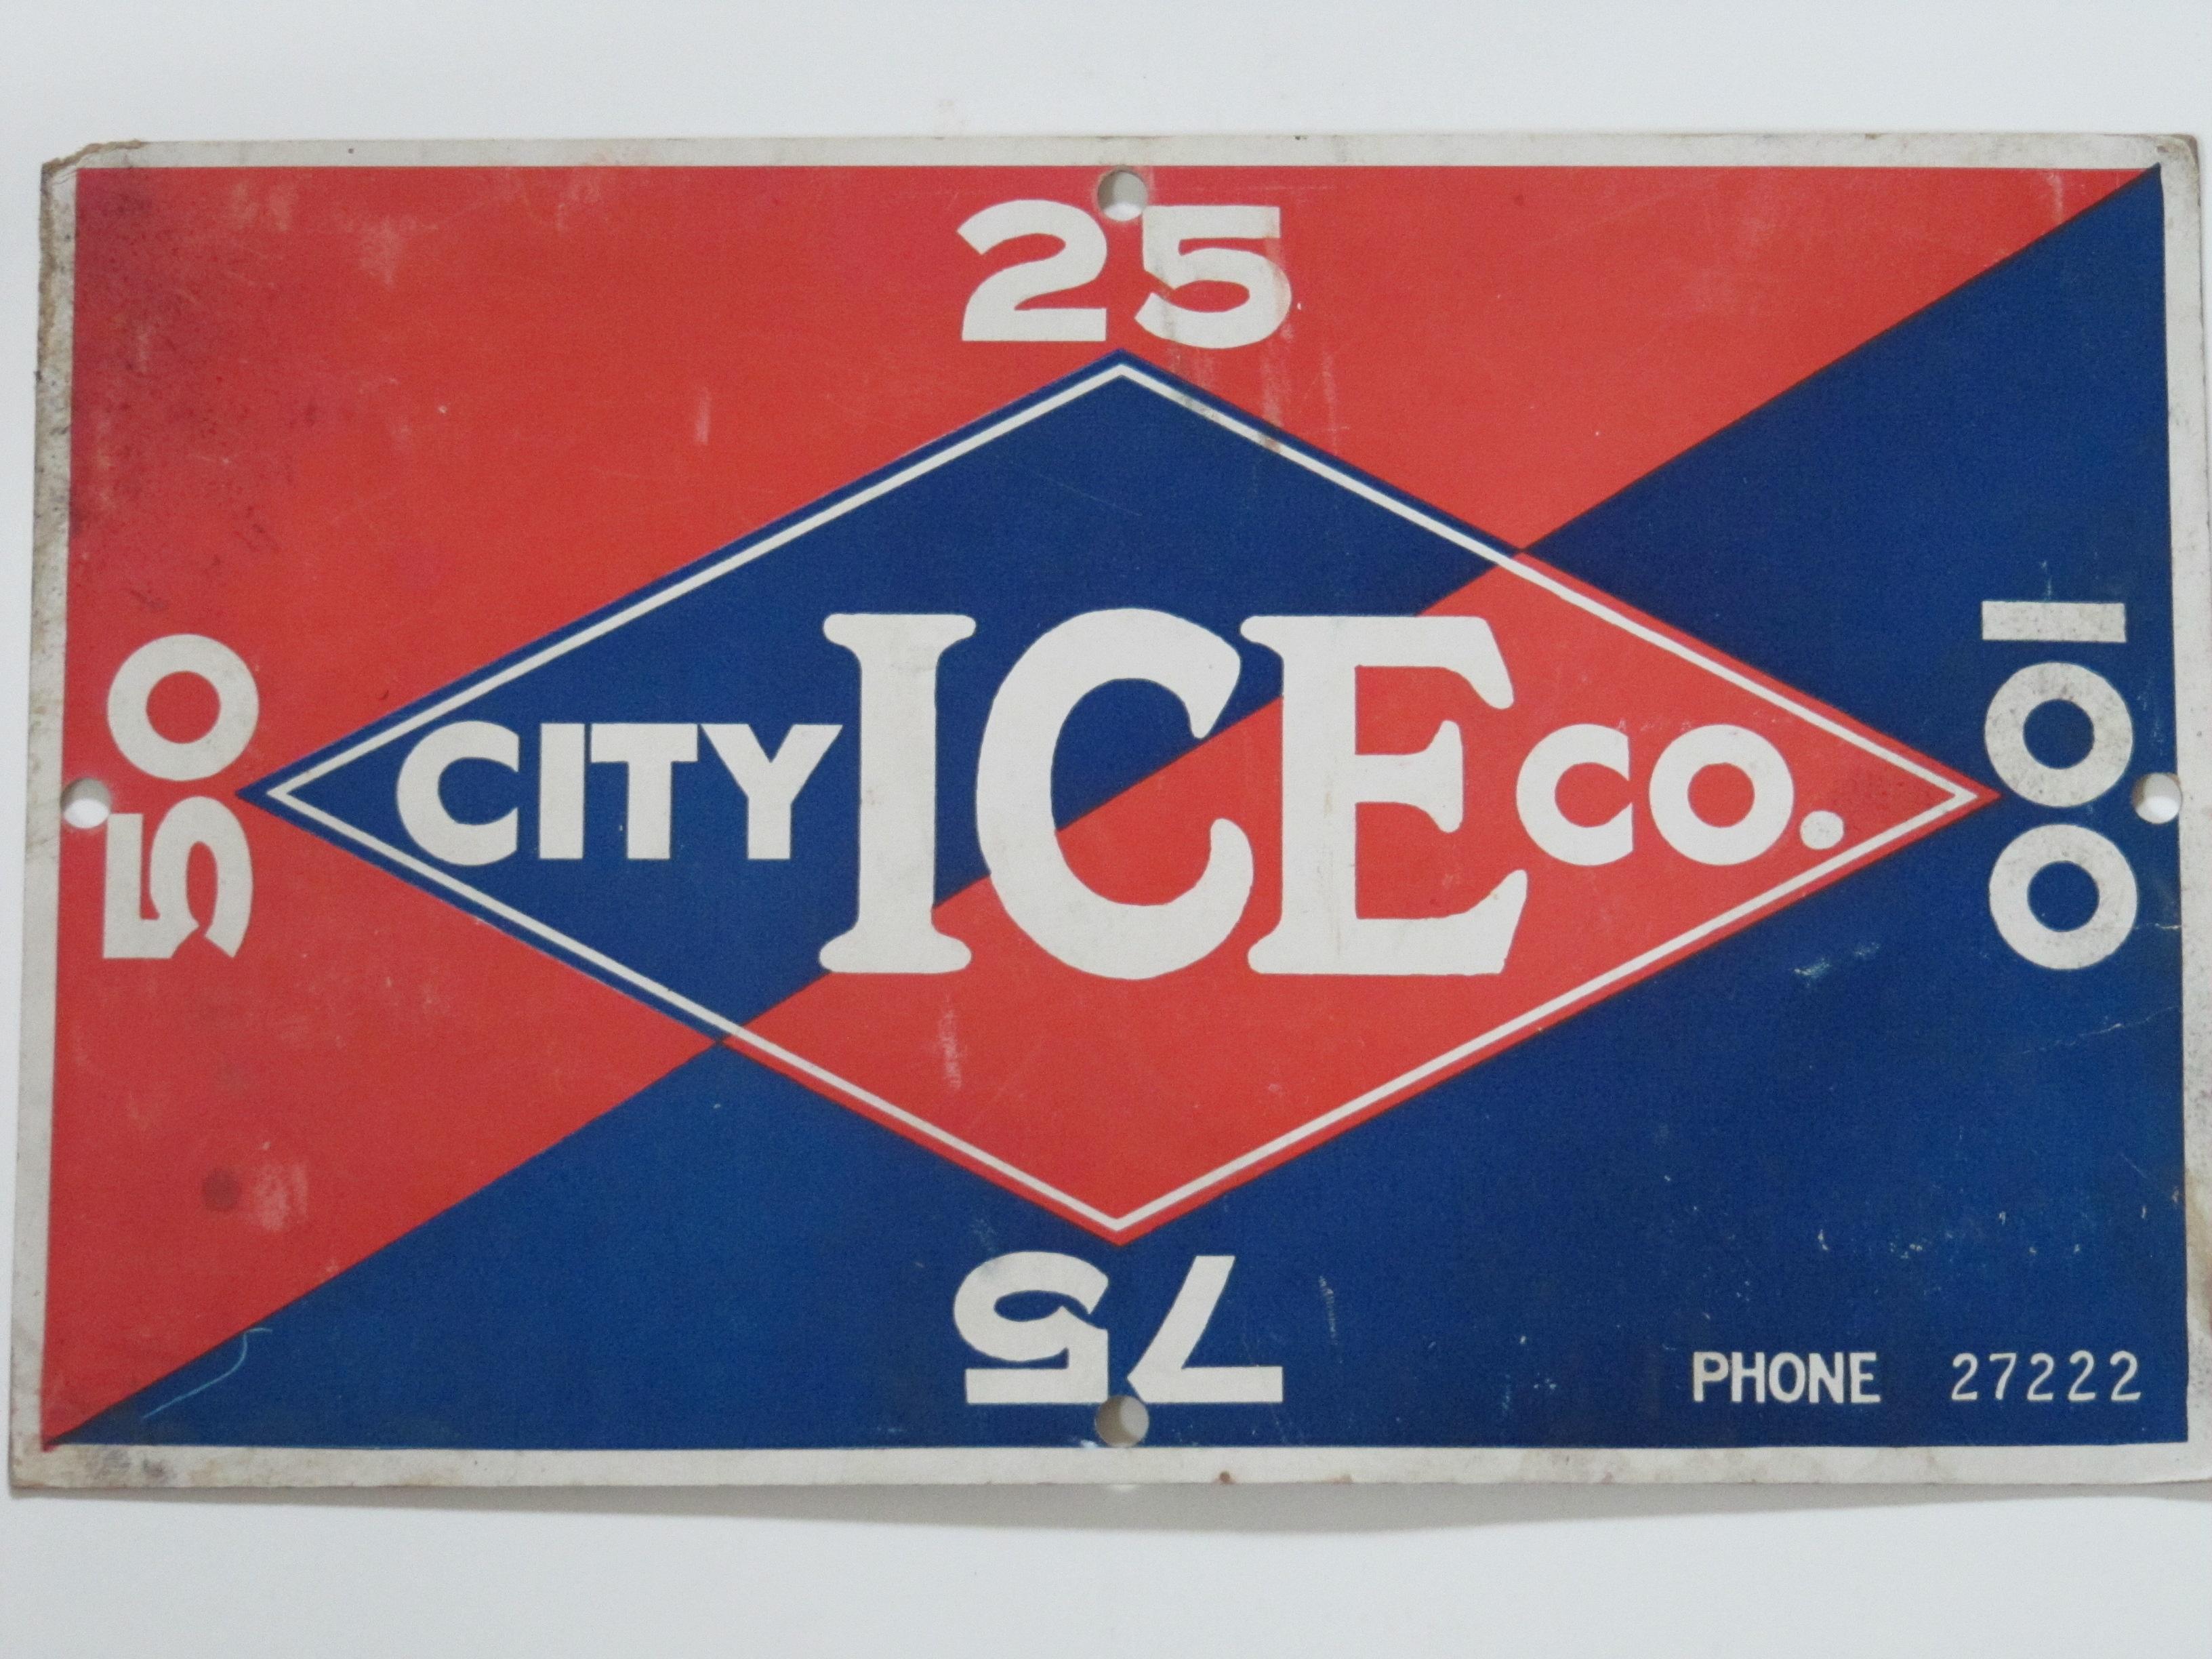 City Ice Co. RedBlue